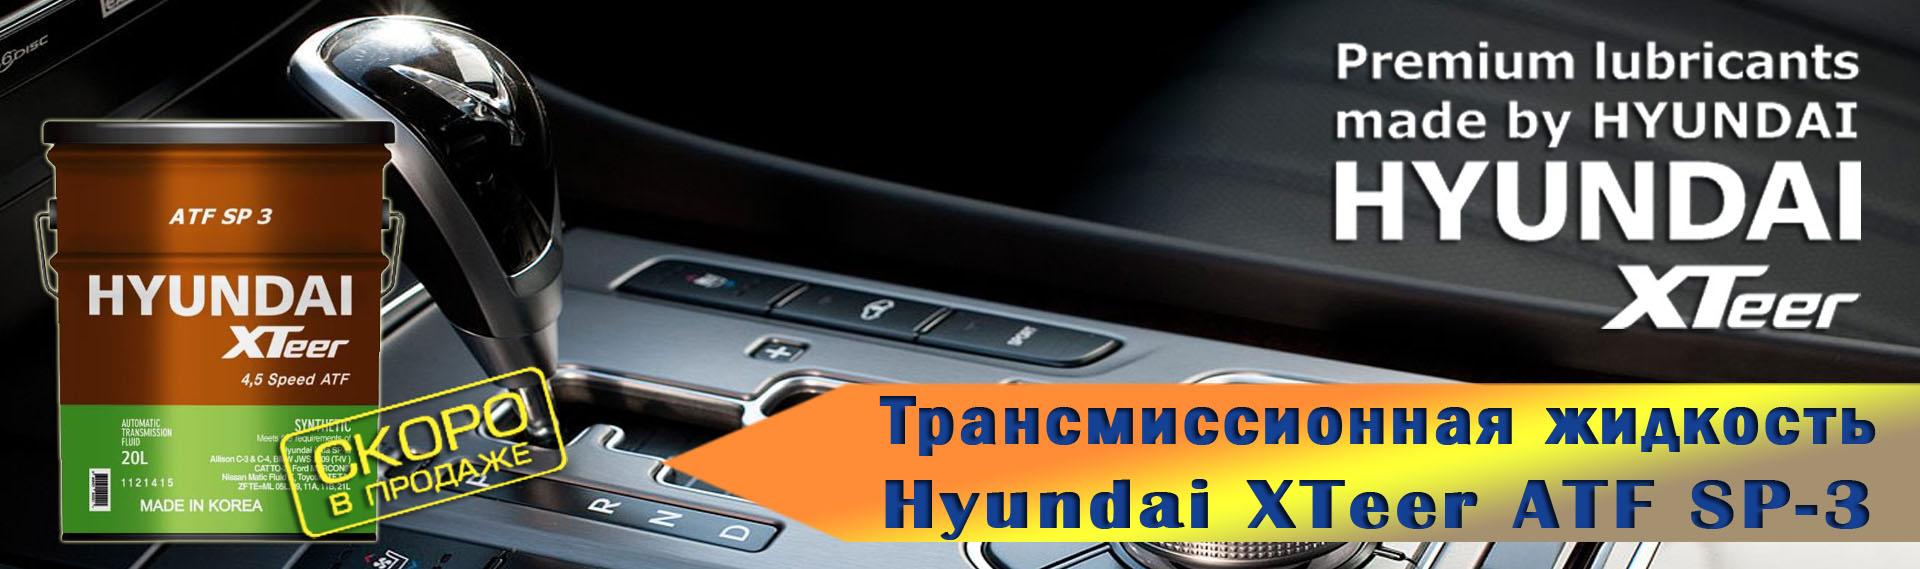 HYUNDAI XTEER ATF SP-3 скоро в продаже